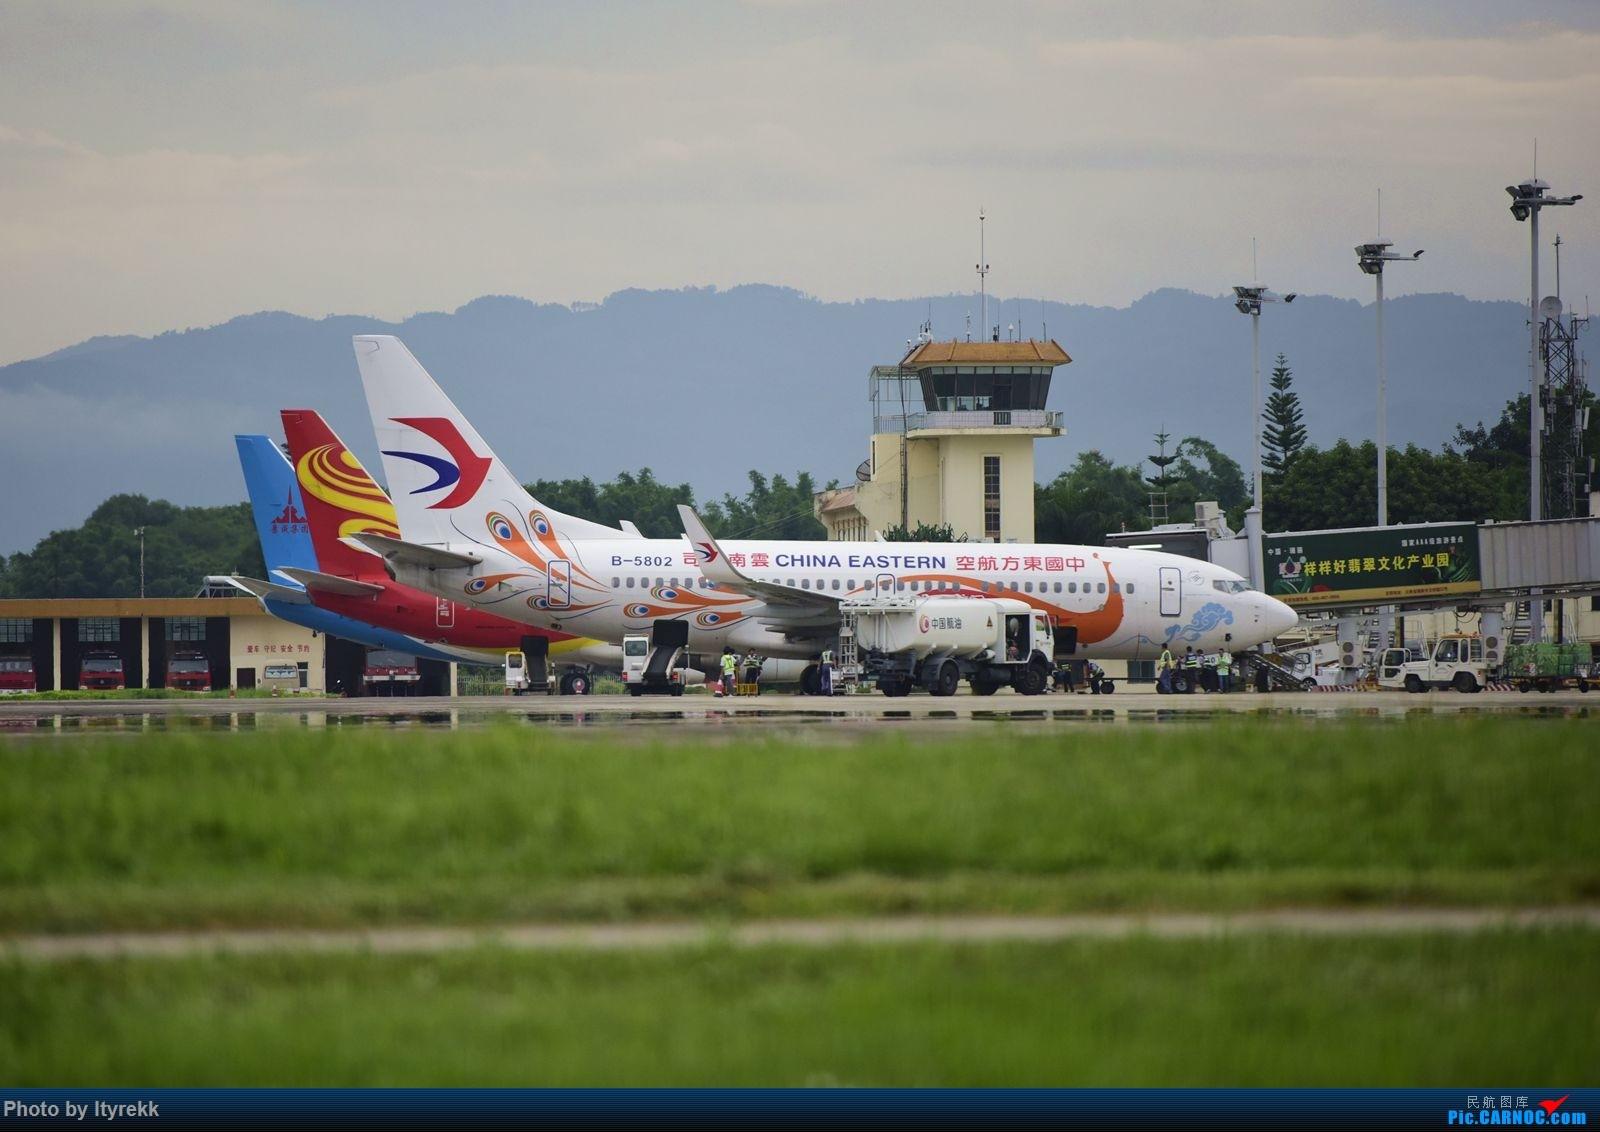 Re:[原创]怀念暑假时飞友们在一起拍机的日子 BOEING 737-700 B-5802 中国芒市机场